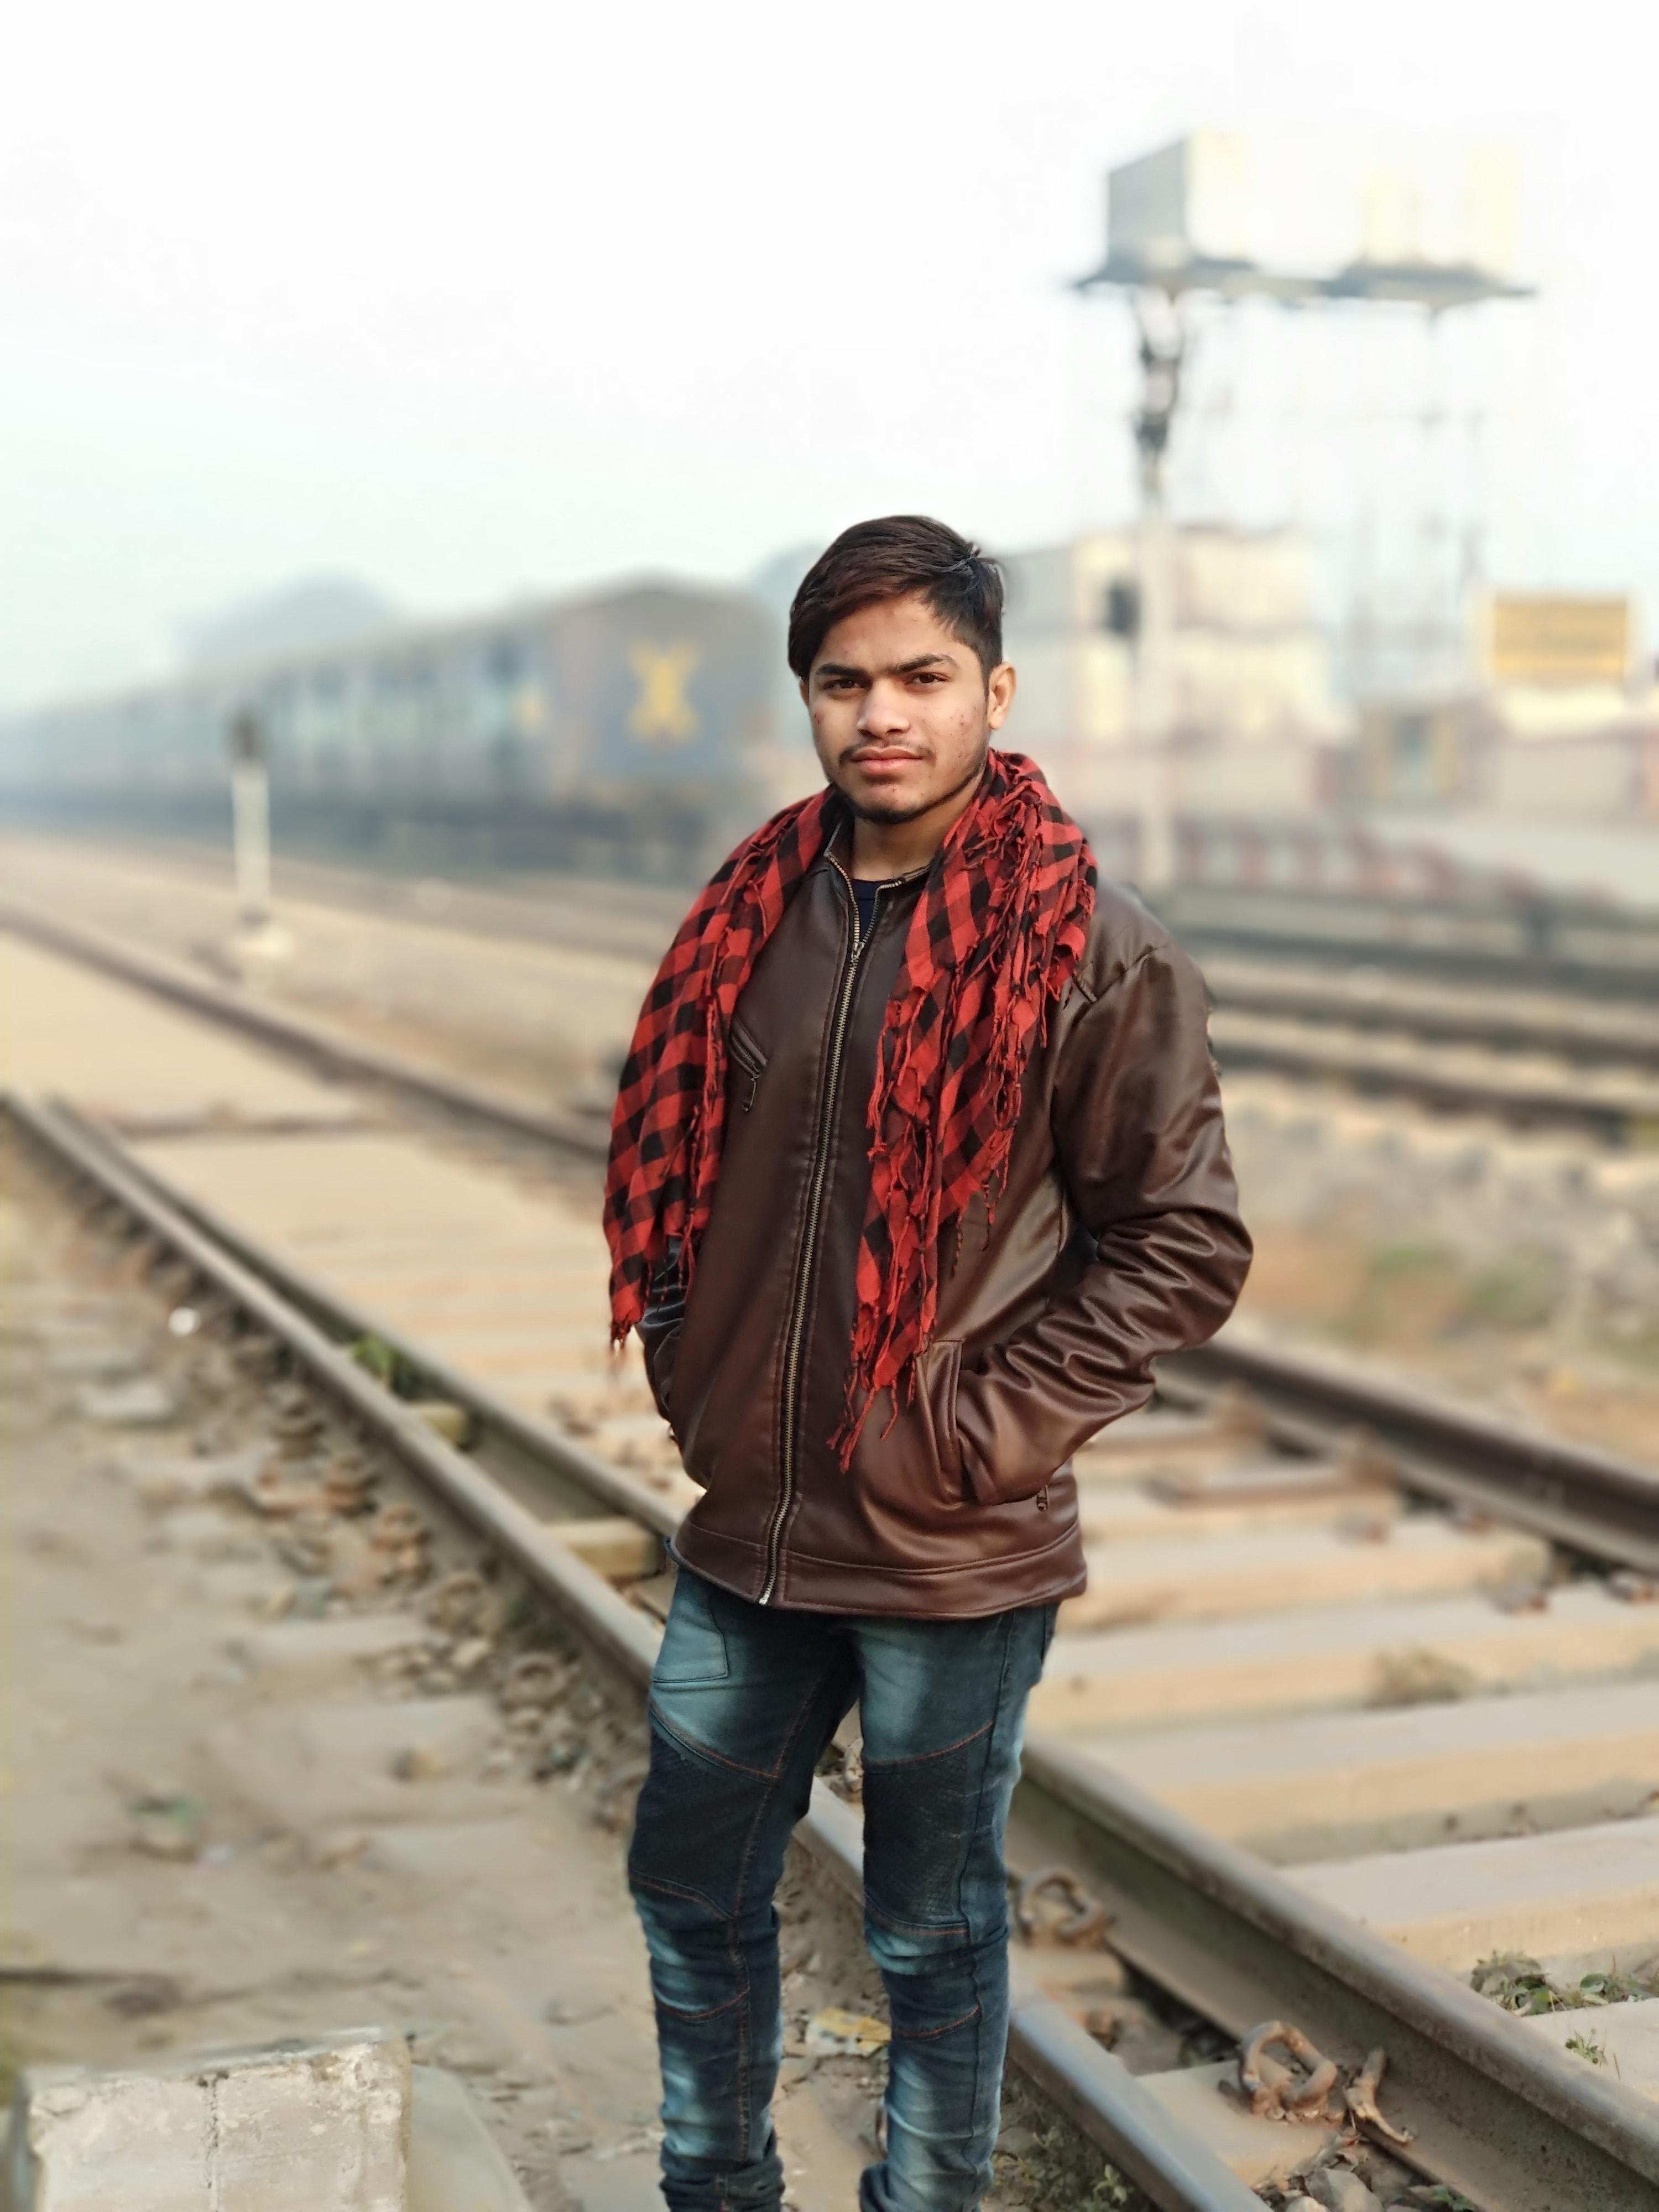 Man Wearing Brown Full-Zip Jacket, Adolescent, Railroad track, Urban, Travel, HQ Photo